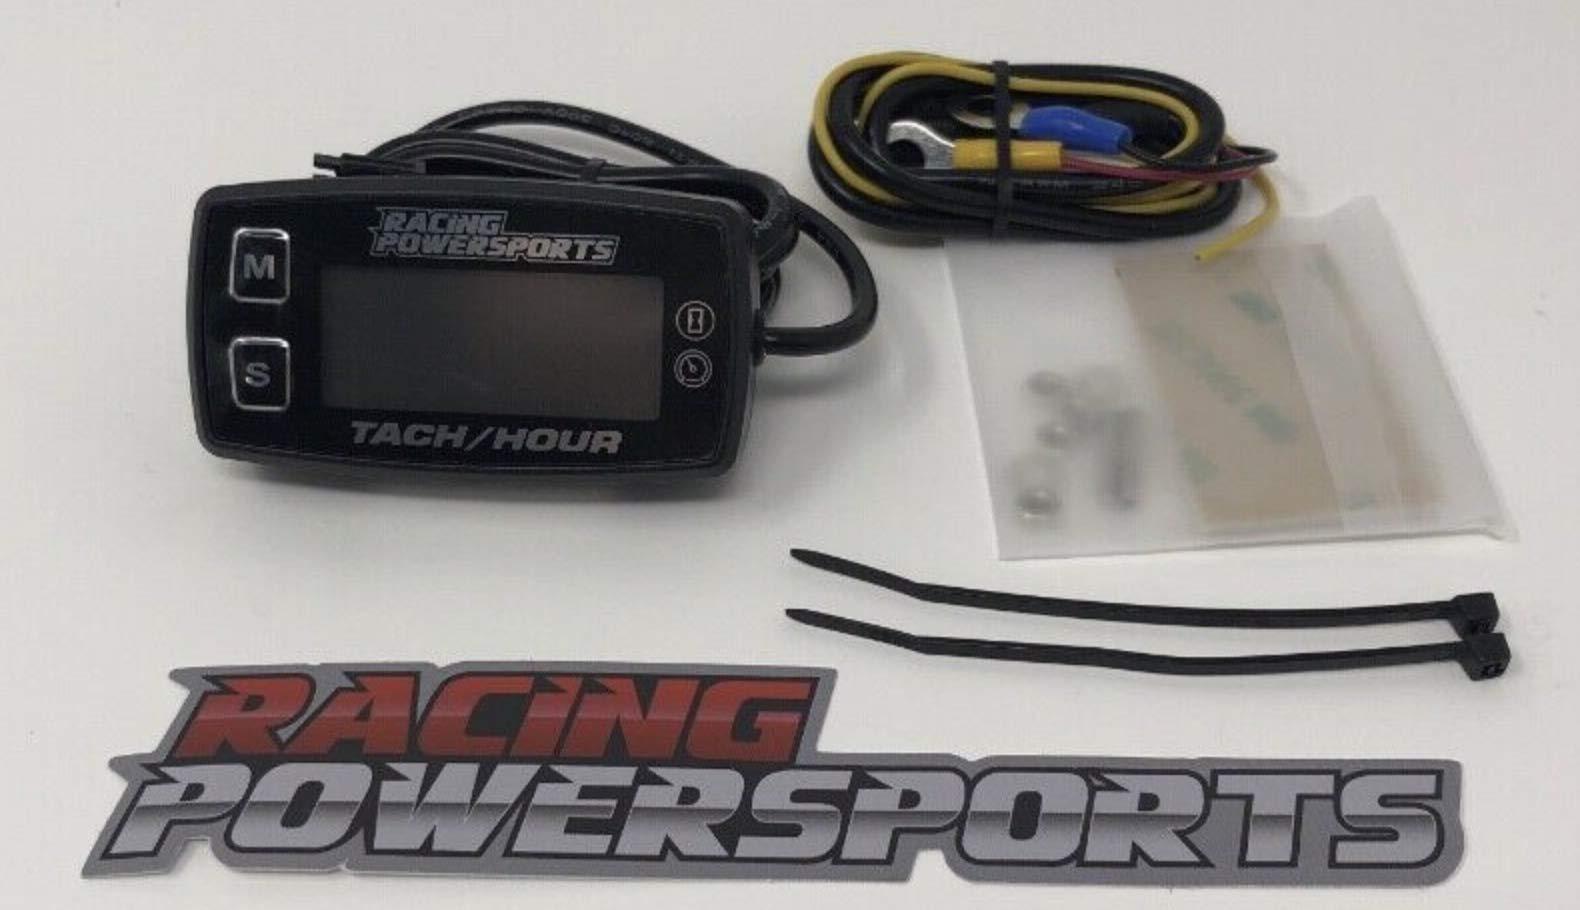 RacingPowerSports LED 12V Backlit Tach Tachometer Hour Meter ATV Boat Bike UTV by RacingPowerSports